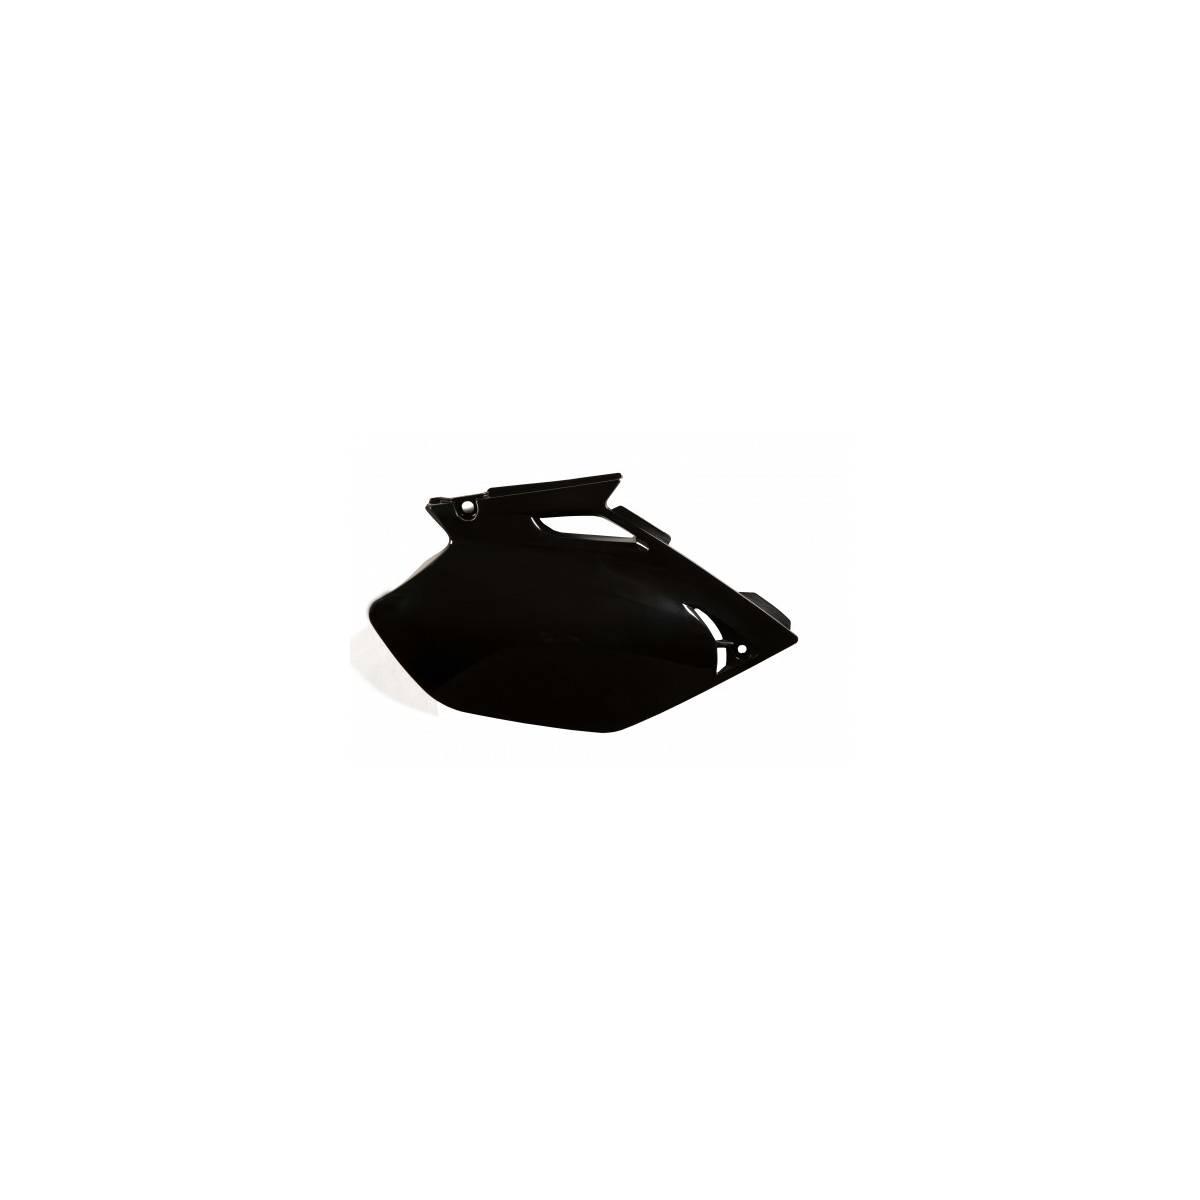 0003669-090 - Aletines Yzf 450 03-05 Negro